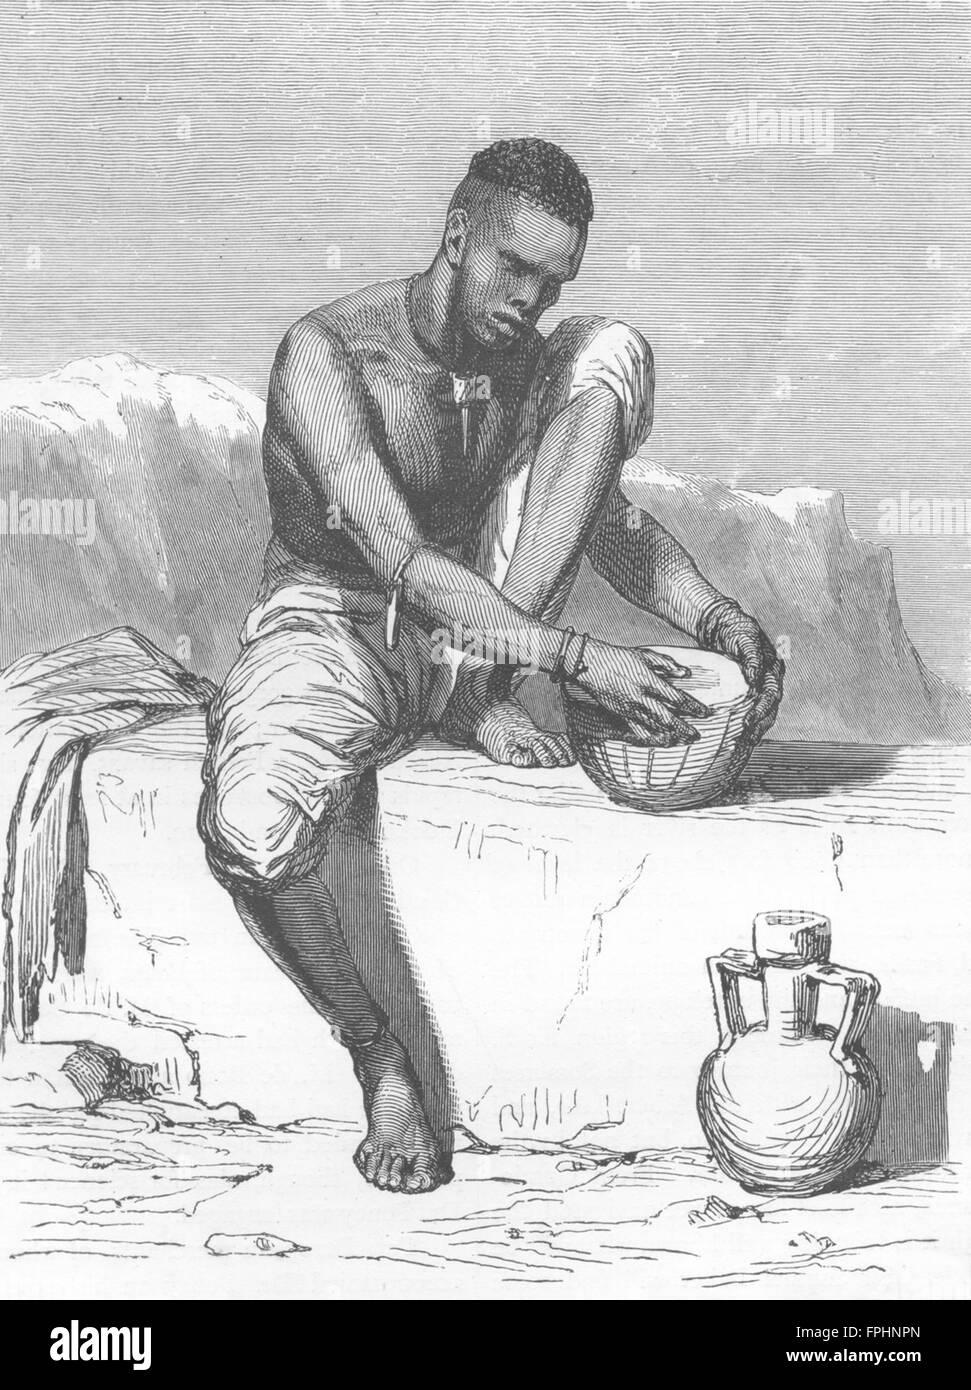 SUDAN: Dinka Tribesman, White Nile, mending his drum, antique print 1880 - Stock Image